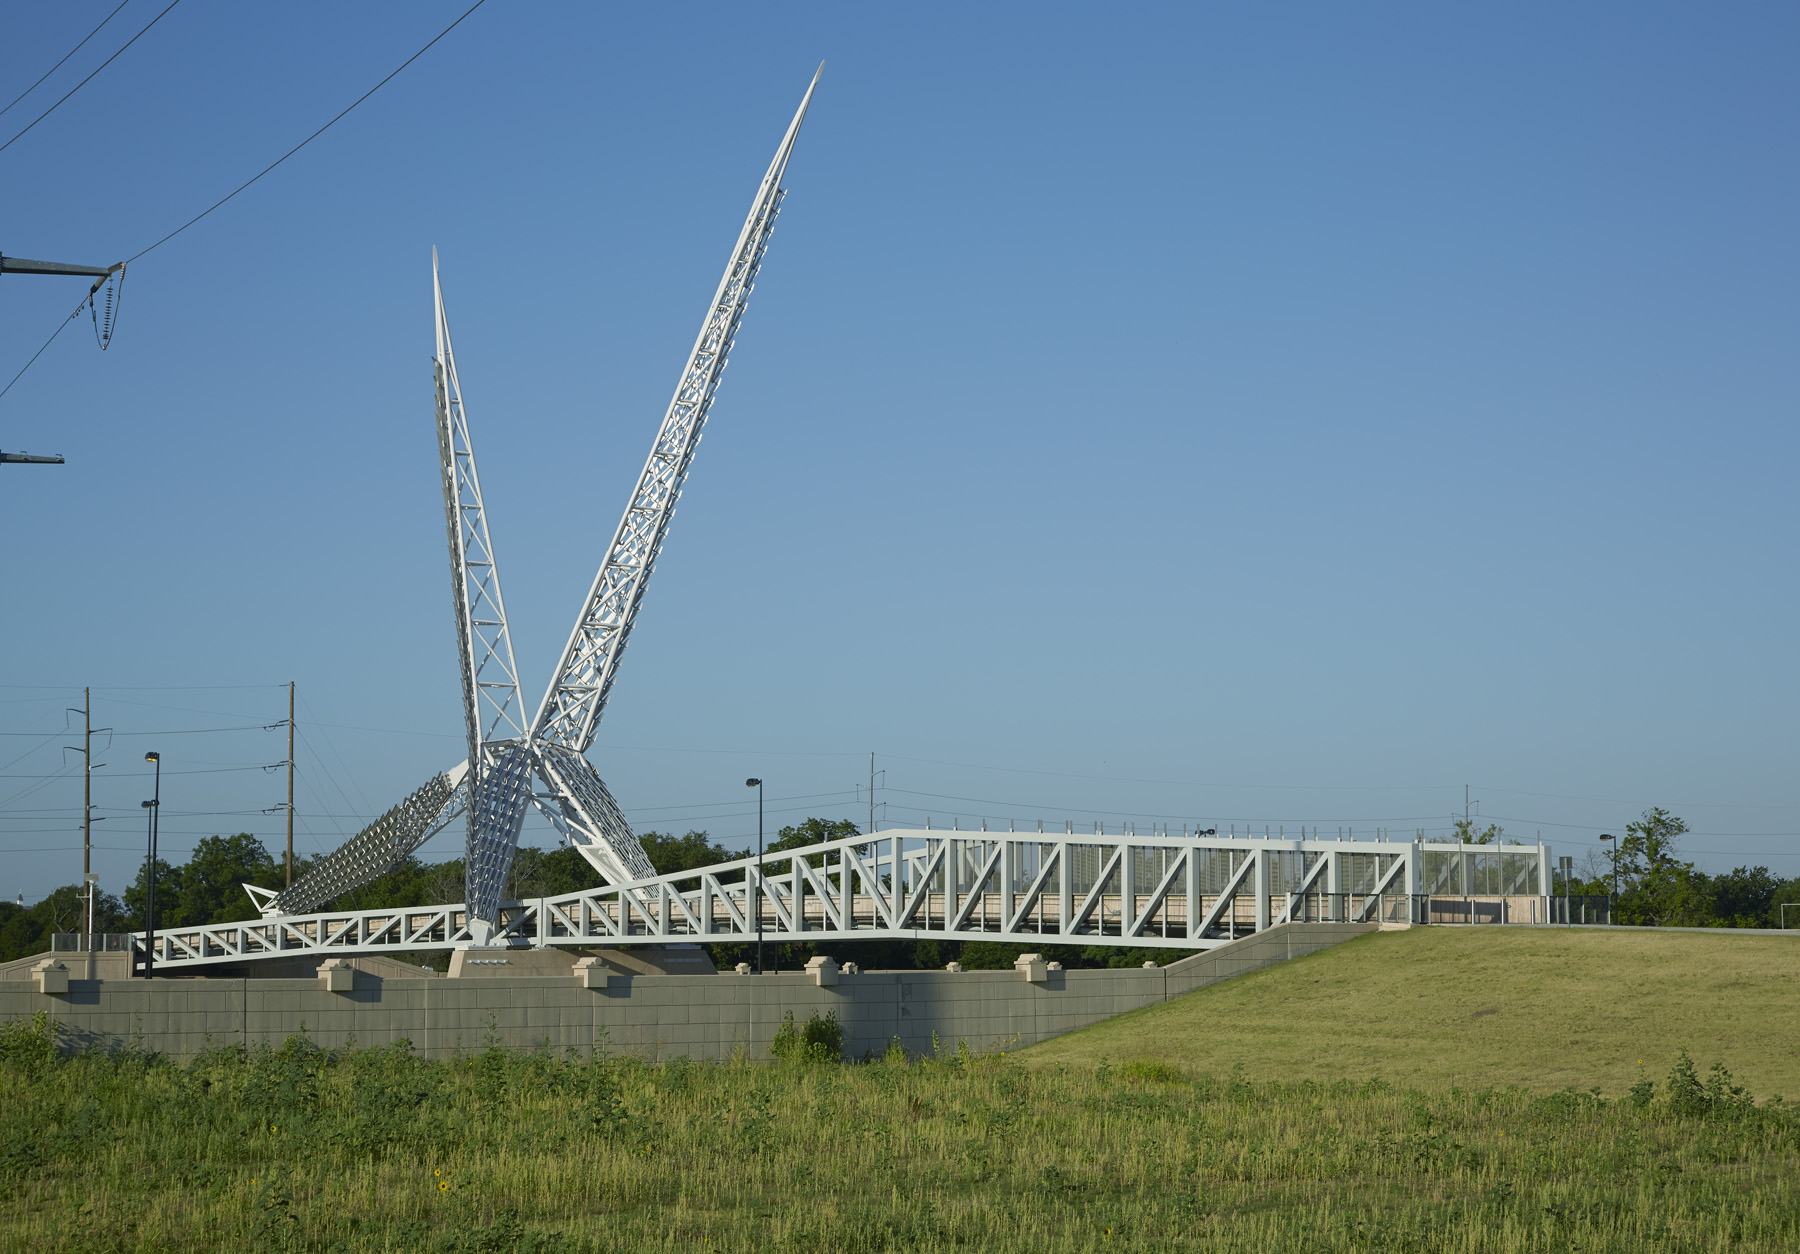 Skydance Bridge photo by Timothy Hursley 001.jpg